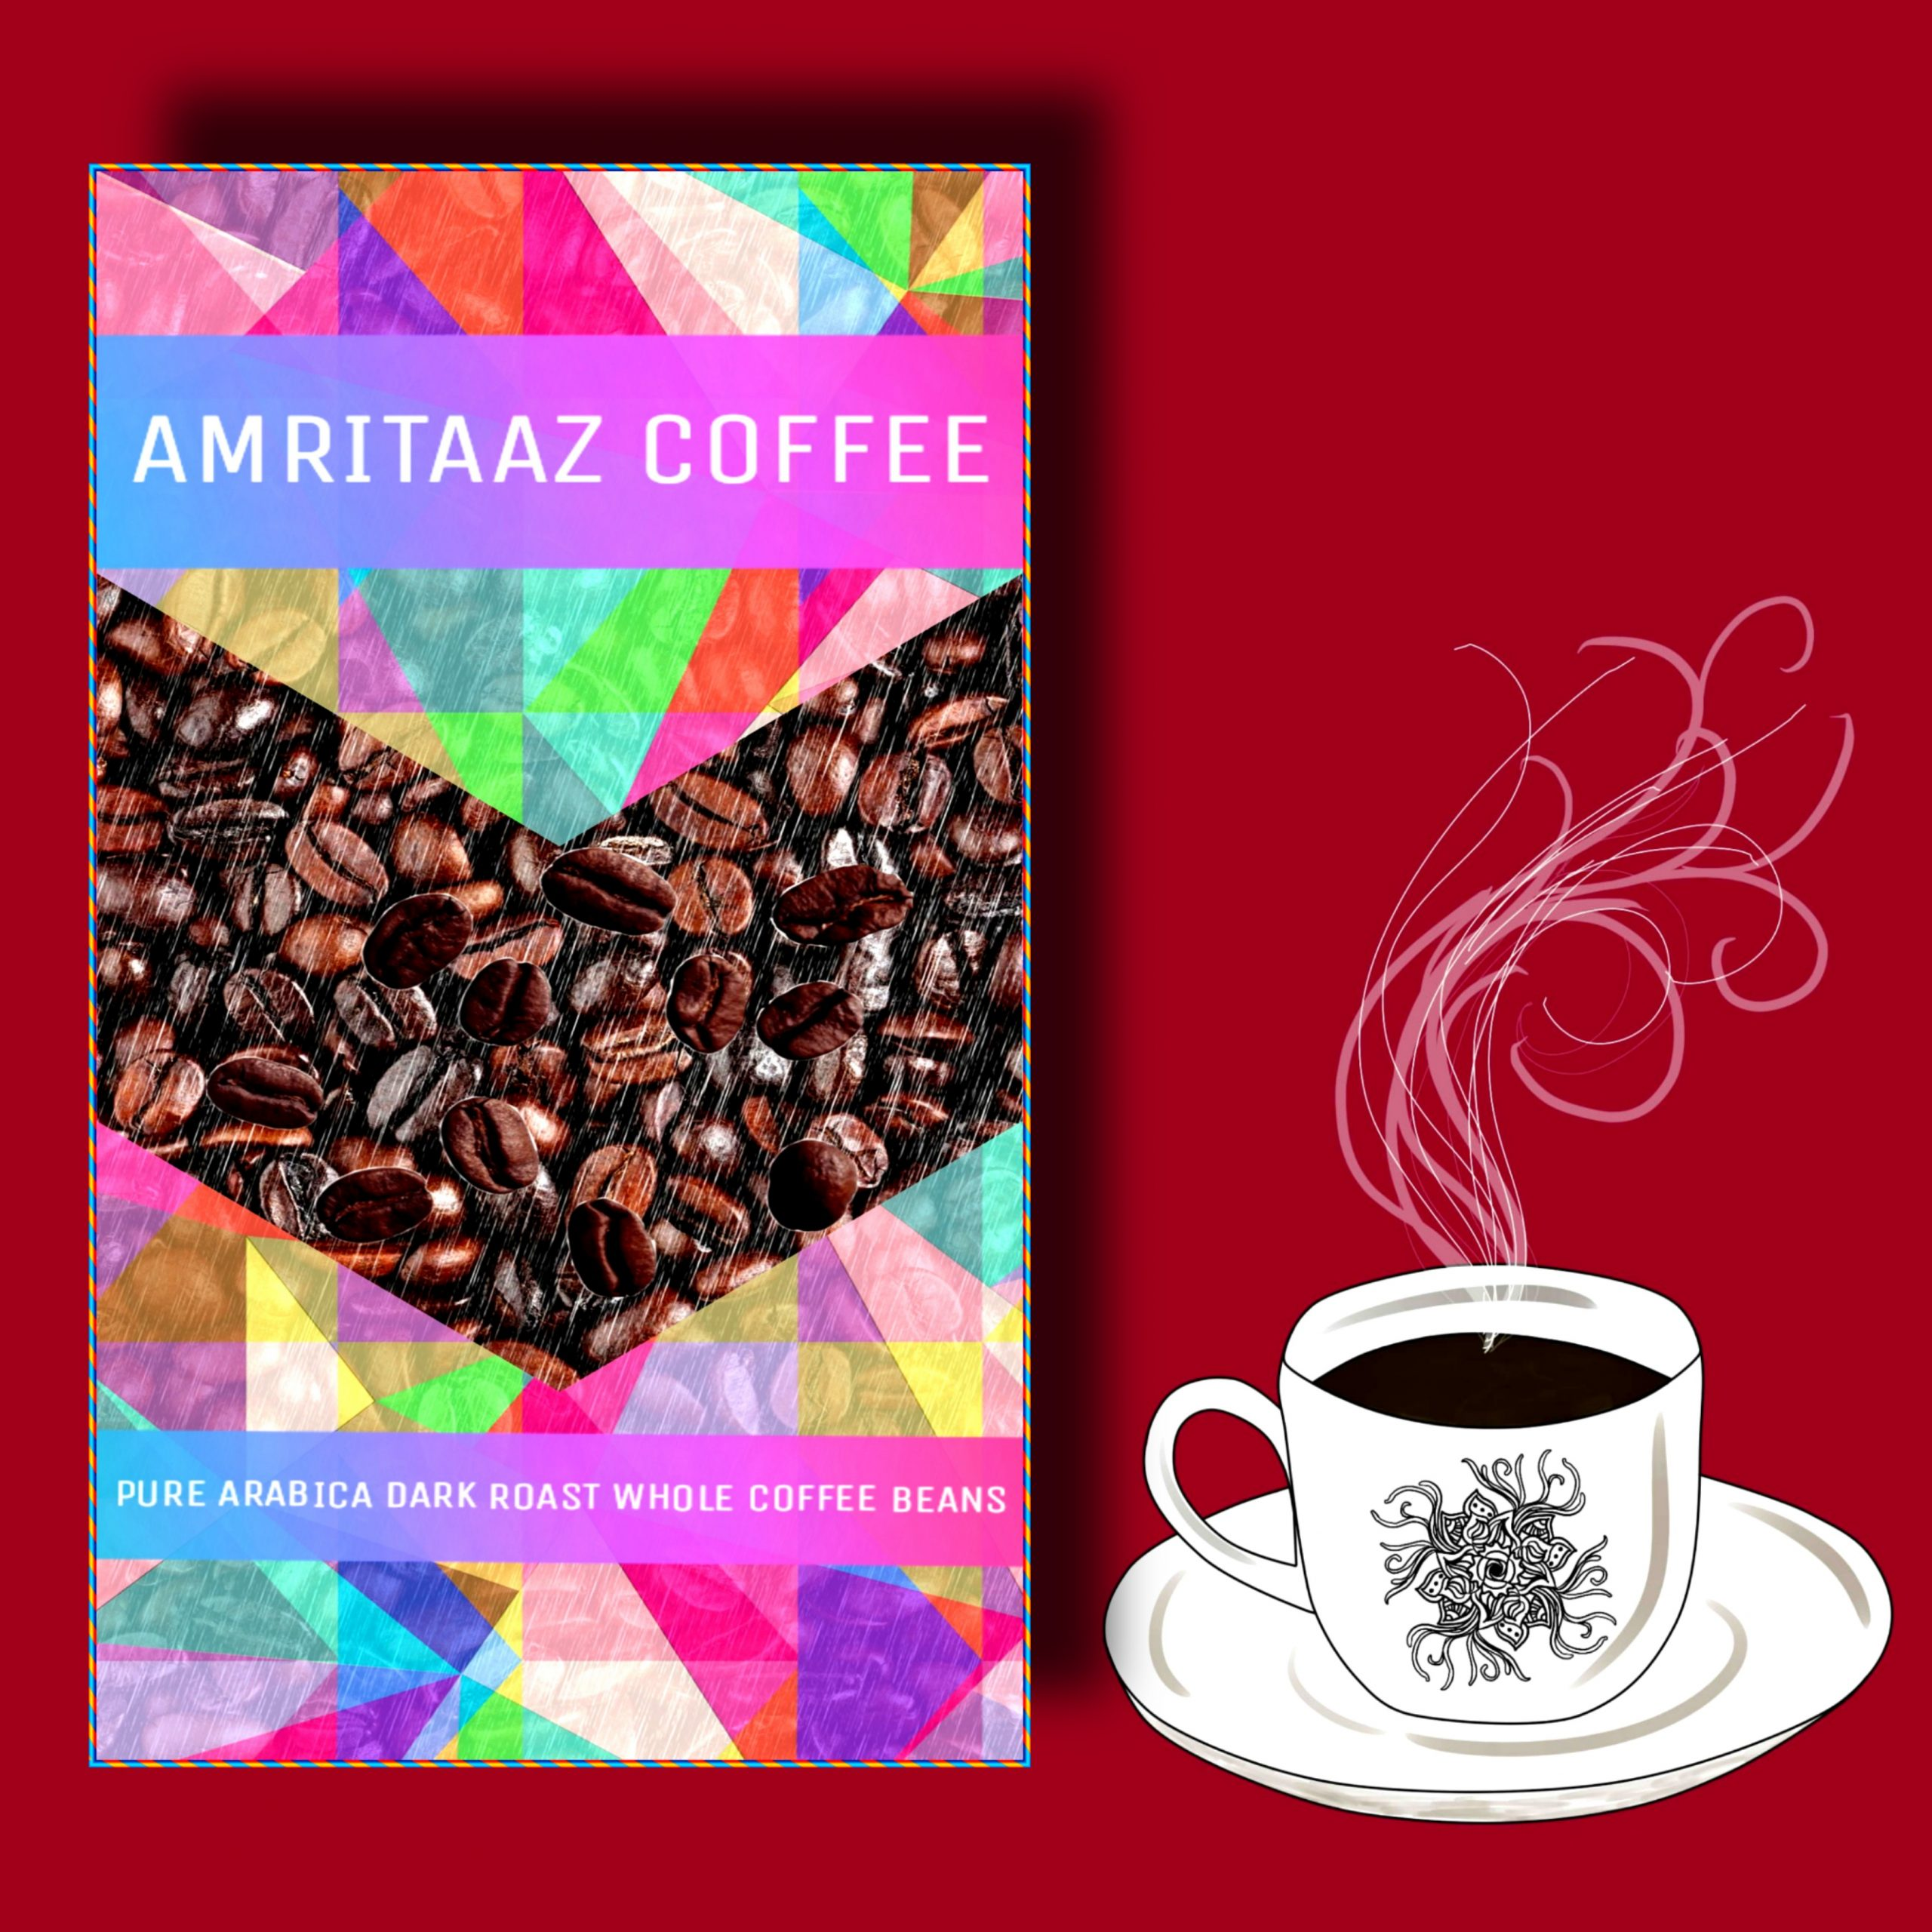 AMRITAAZ COFFEE Pure Arabica Dark Roasted Whole Coffee Beans (5 kgs)